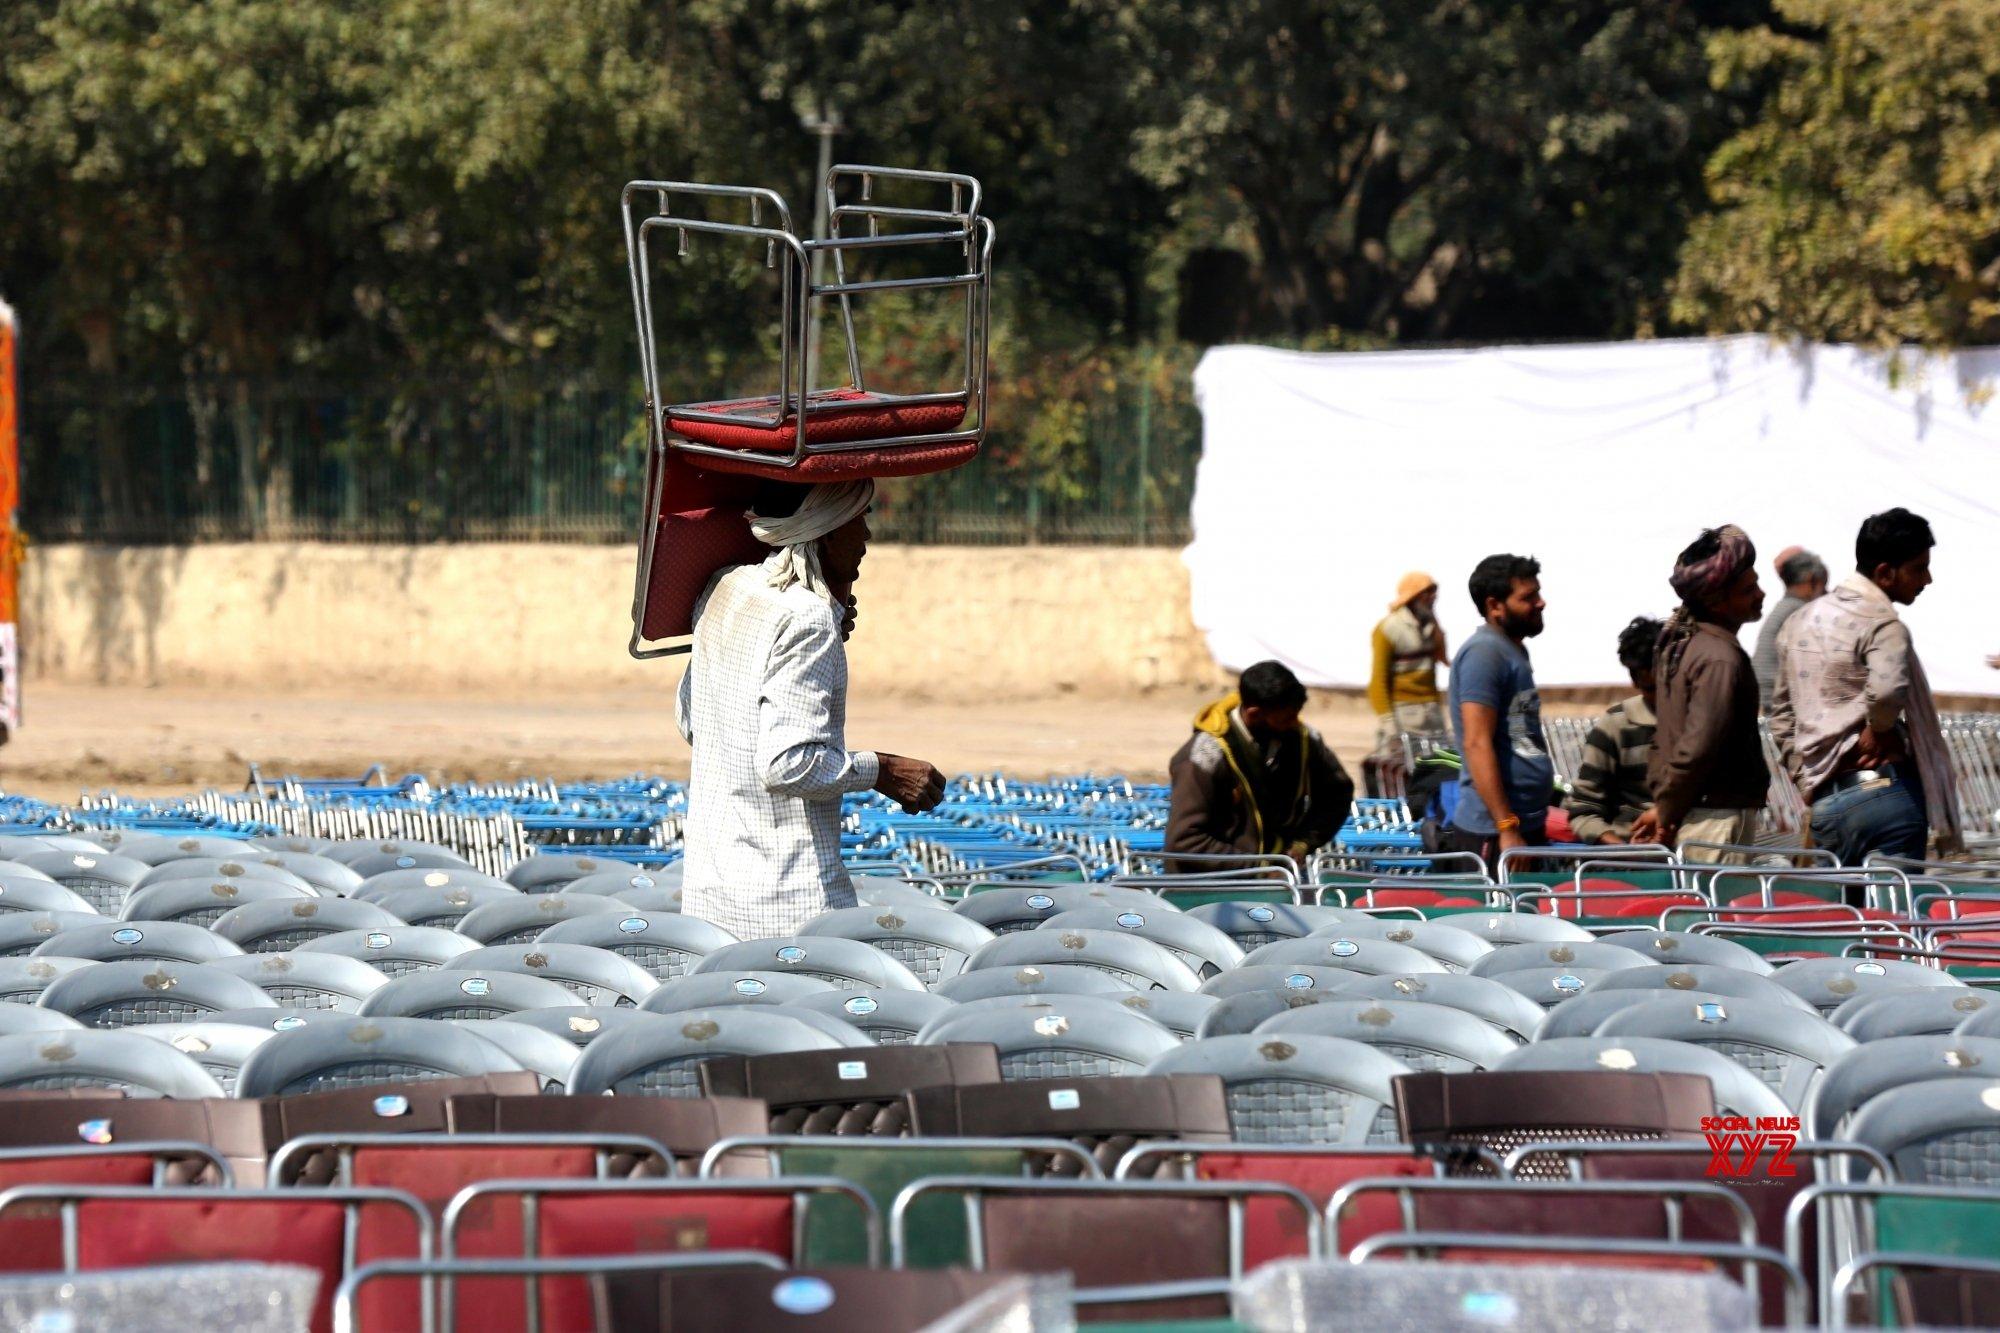 New Delhi: Preparations for Kejriwal's wearing - in ceremony underway at Ramlila Ground (Batch - 2) #Gallery